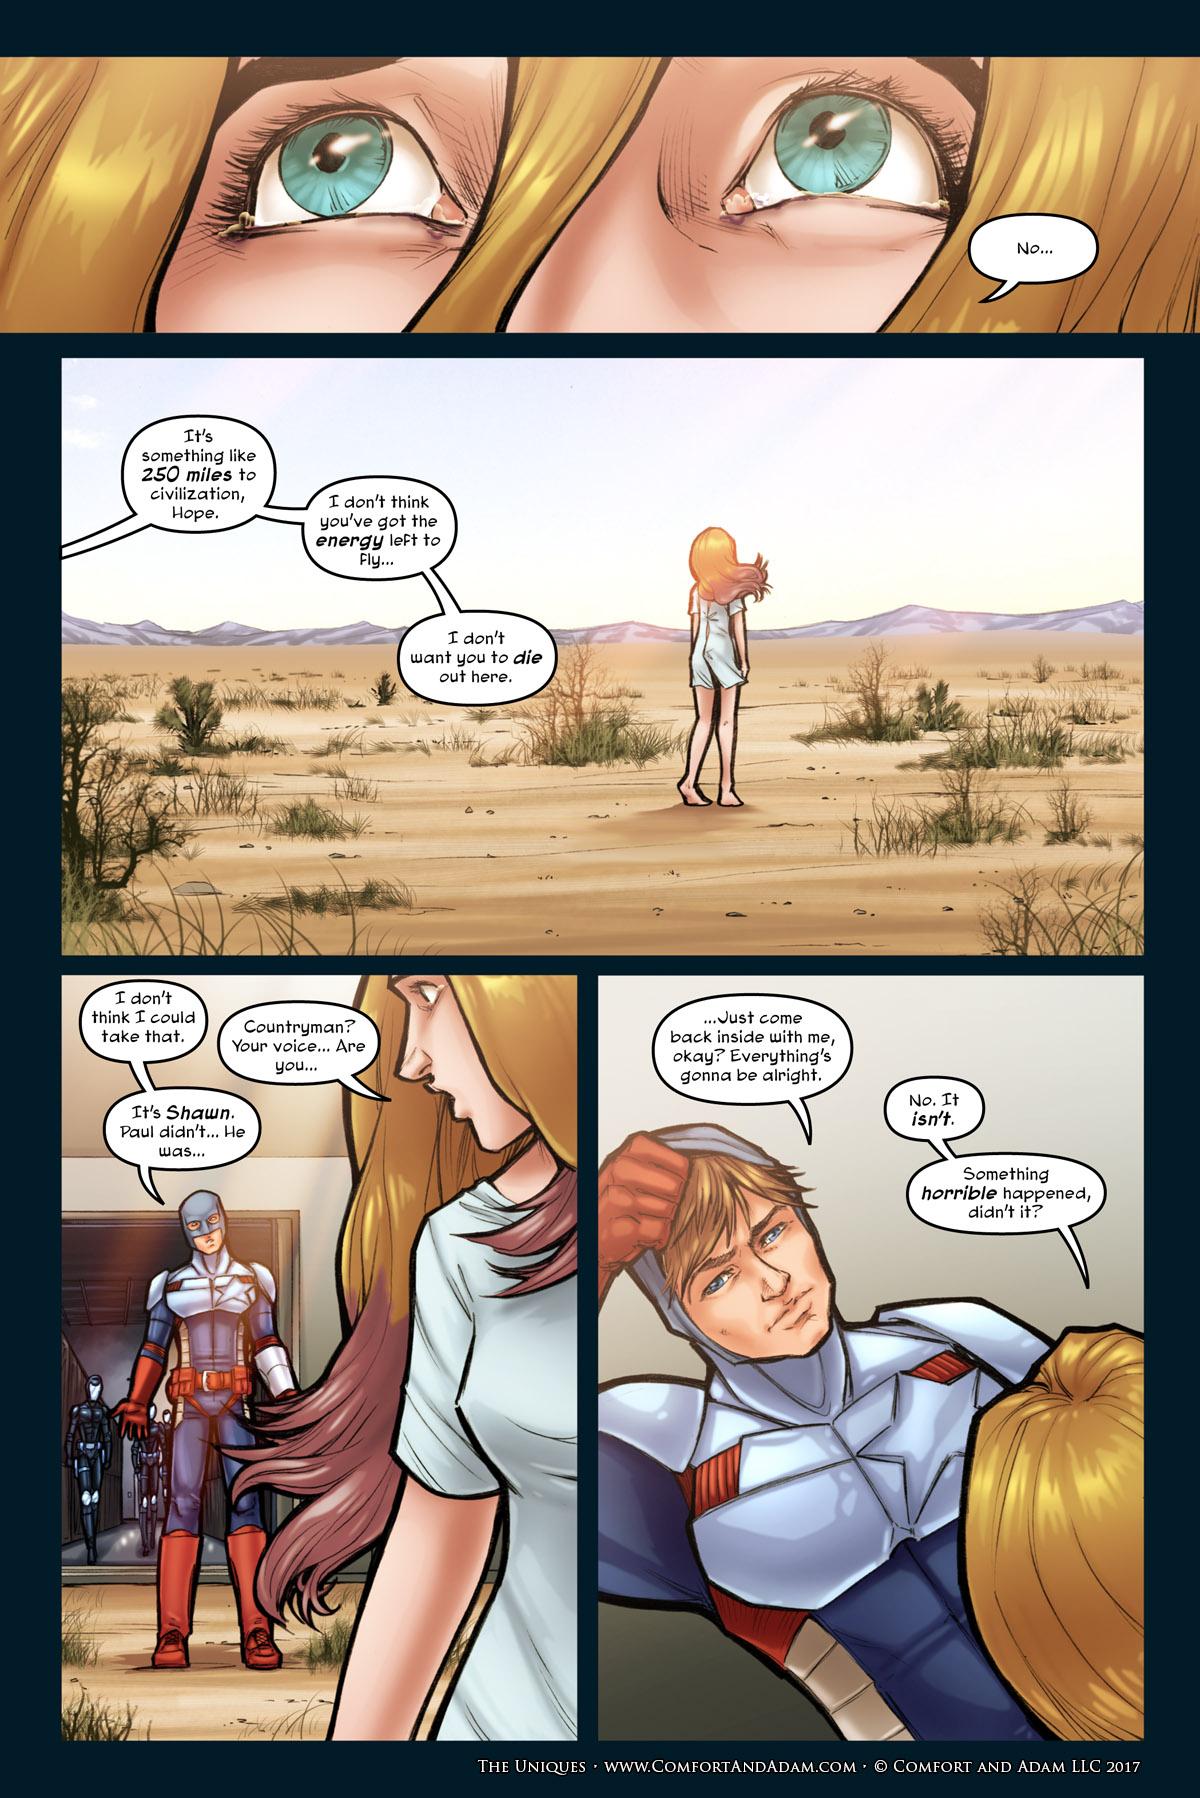 The Uniques #1 pg. 13: Countryman